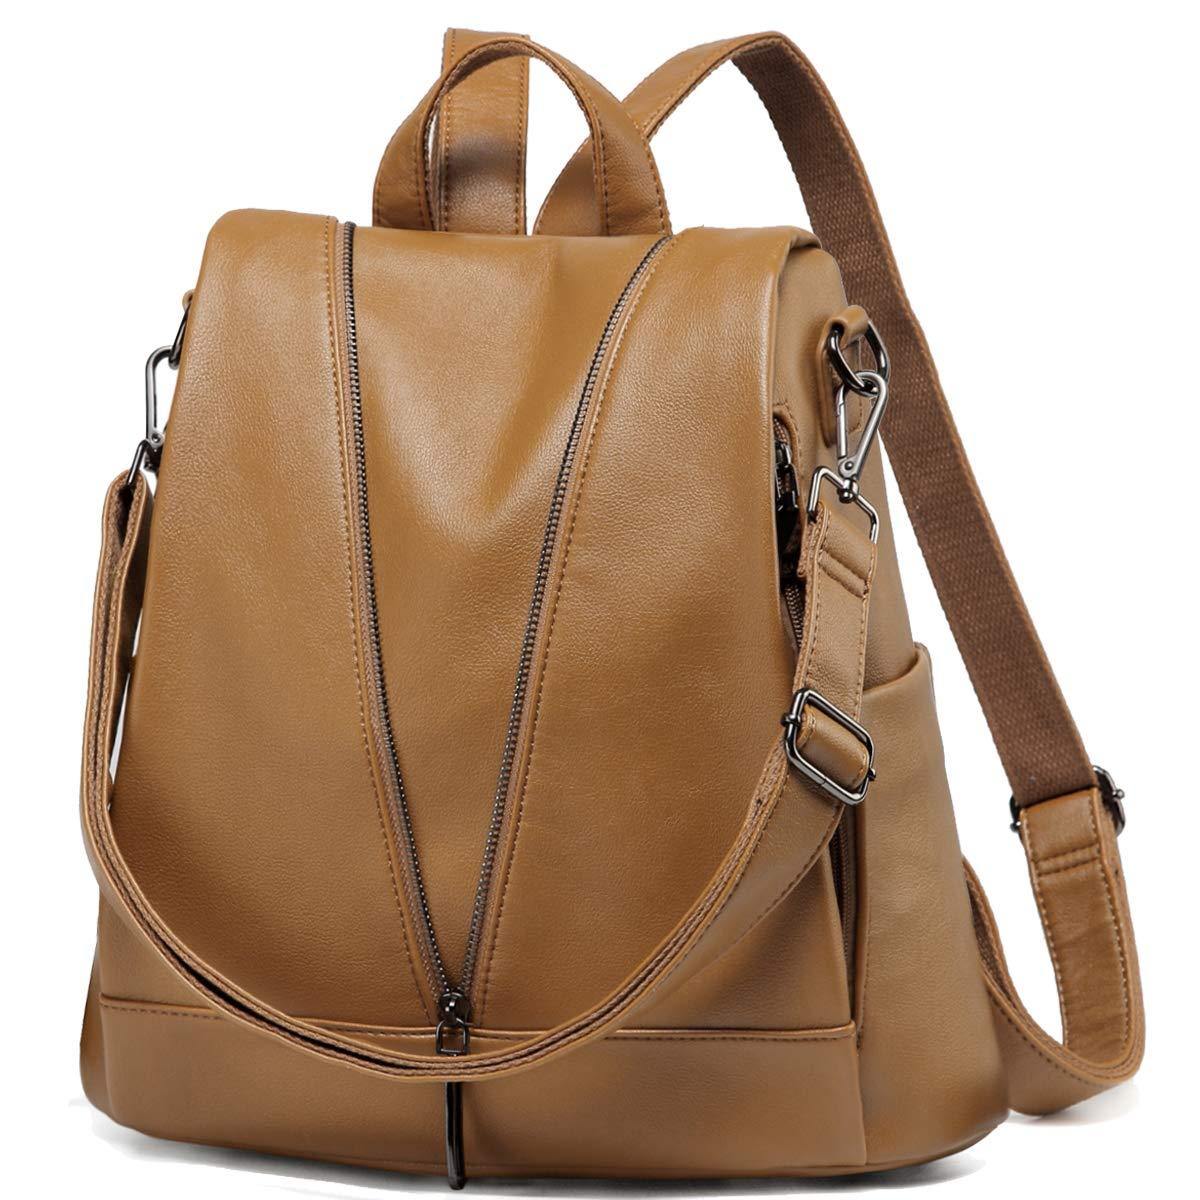 Women Backpack Purse,Kasqo Anti-theft PU Leather Fashion Shoulder Bag Travel Girls Rucksack